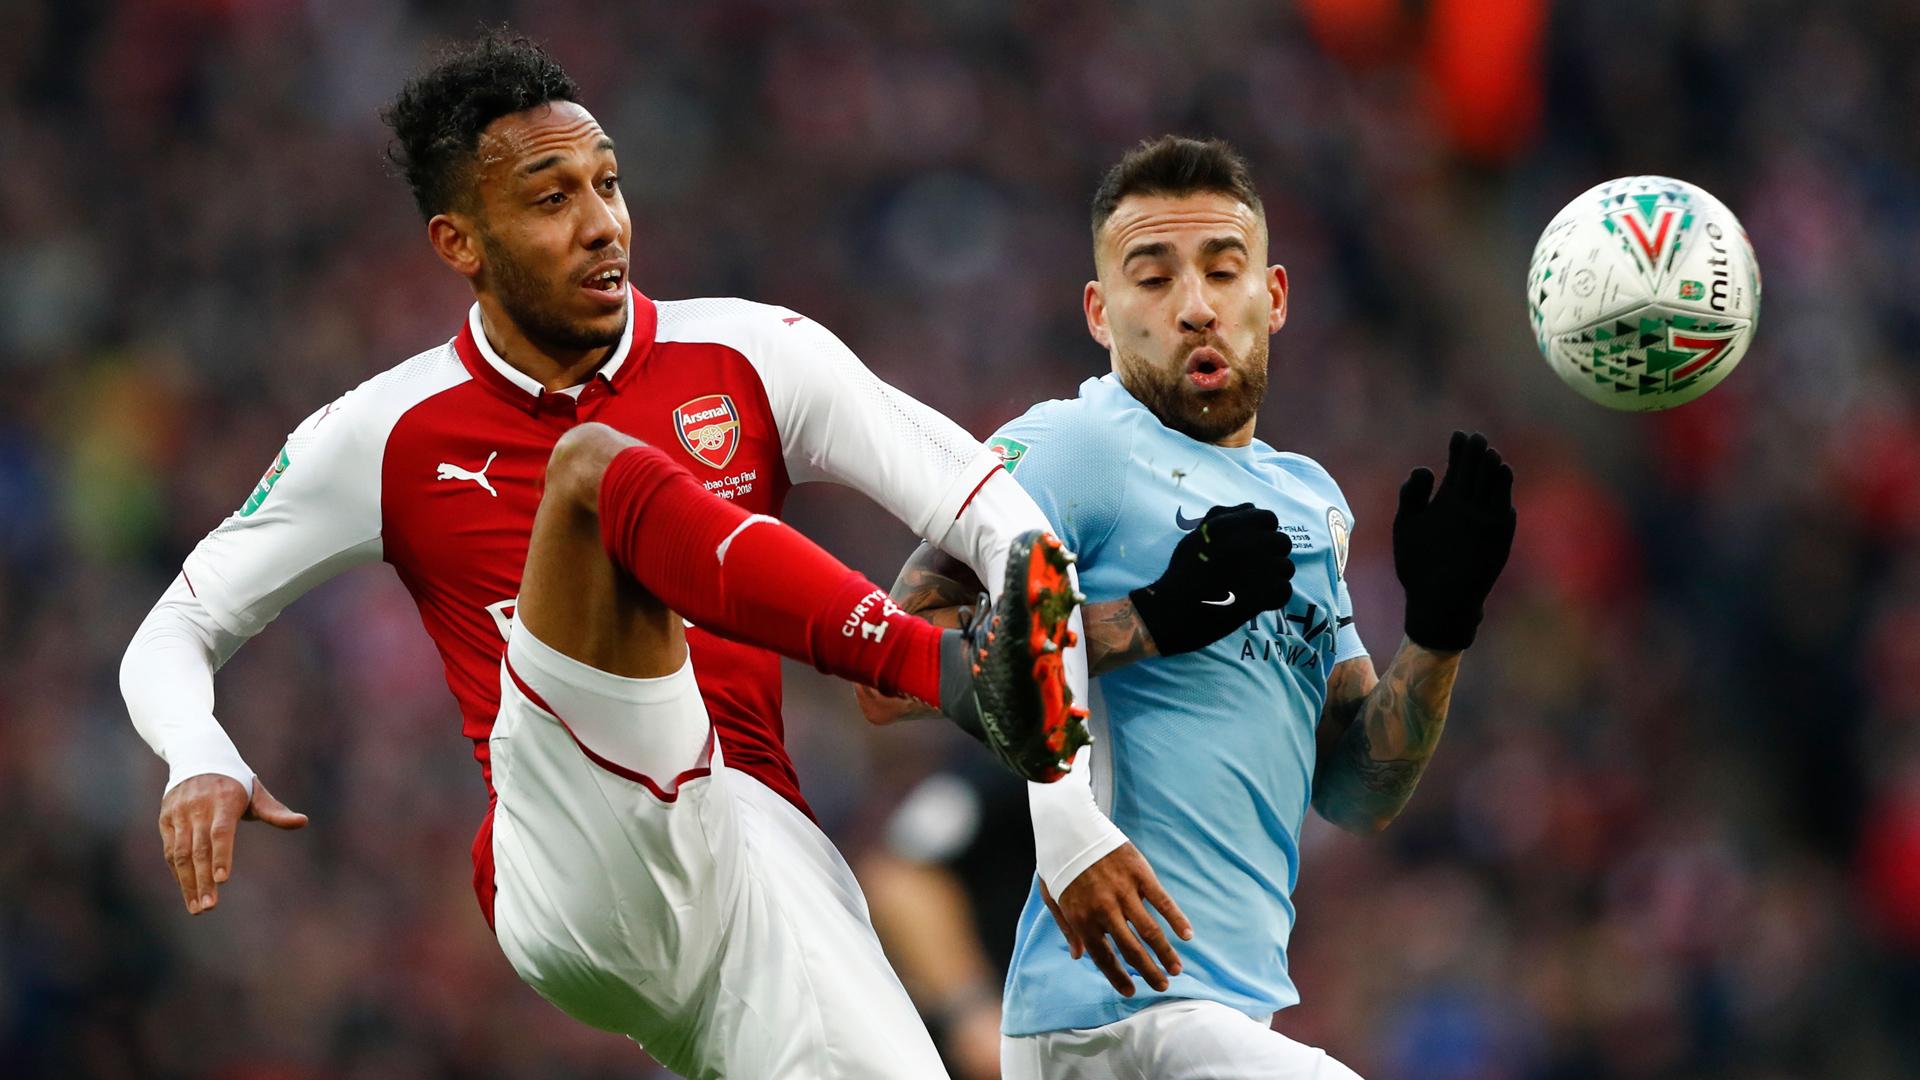 FC Arsenal Manchester City Aubameyang Otamendi 25022018